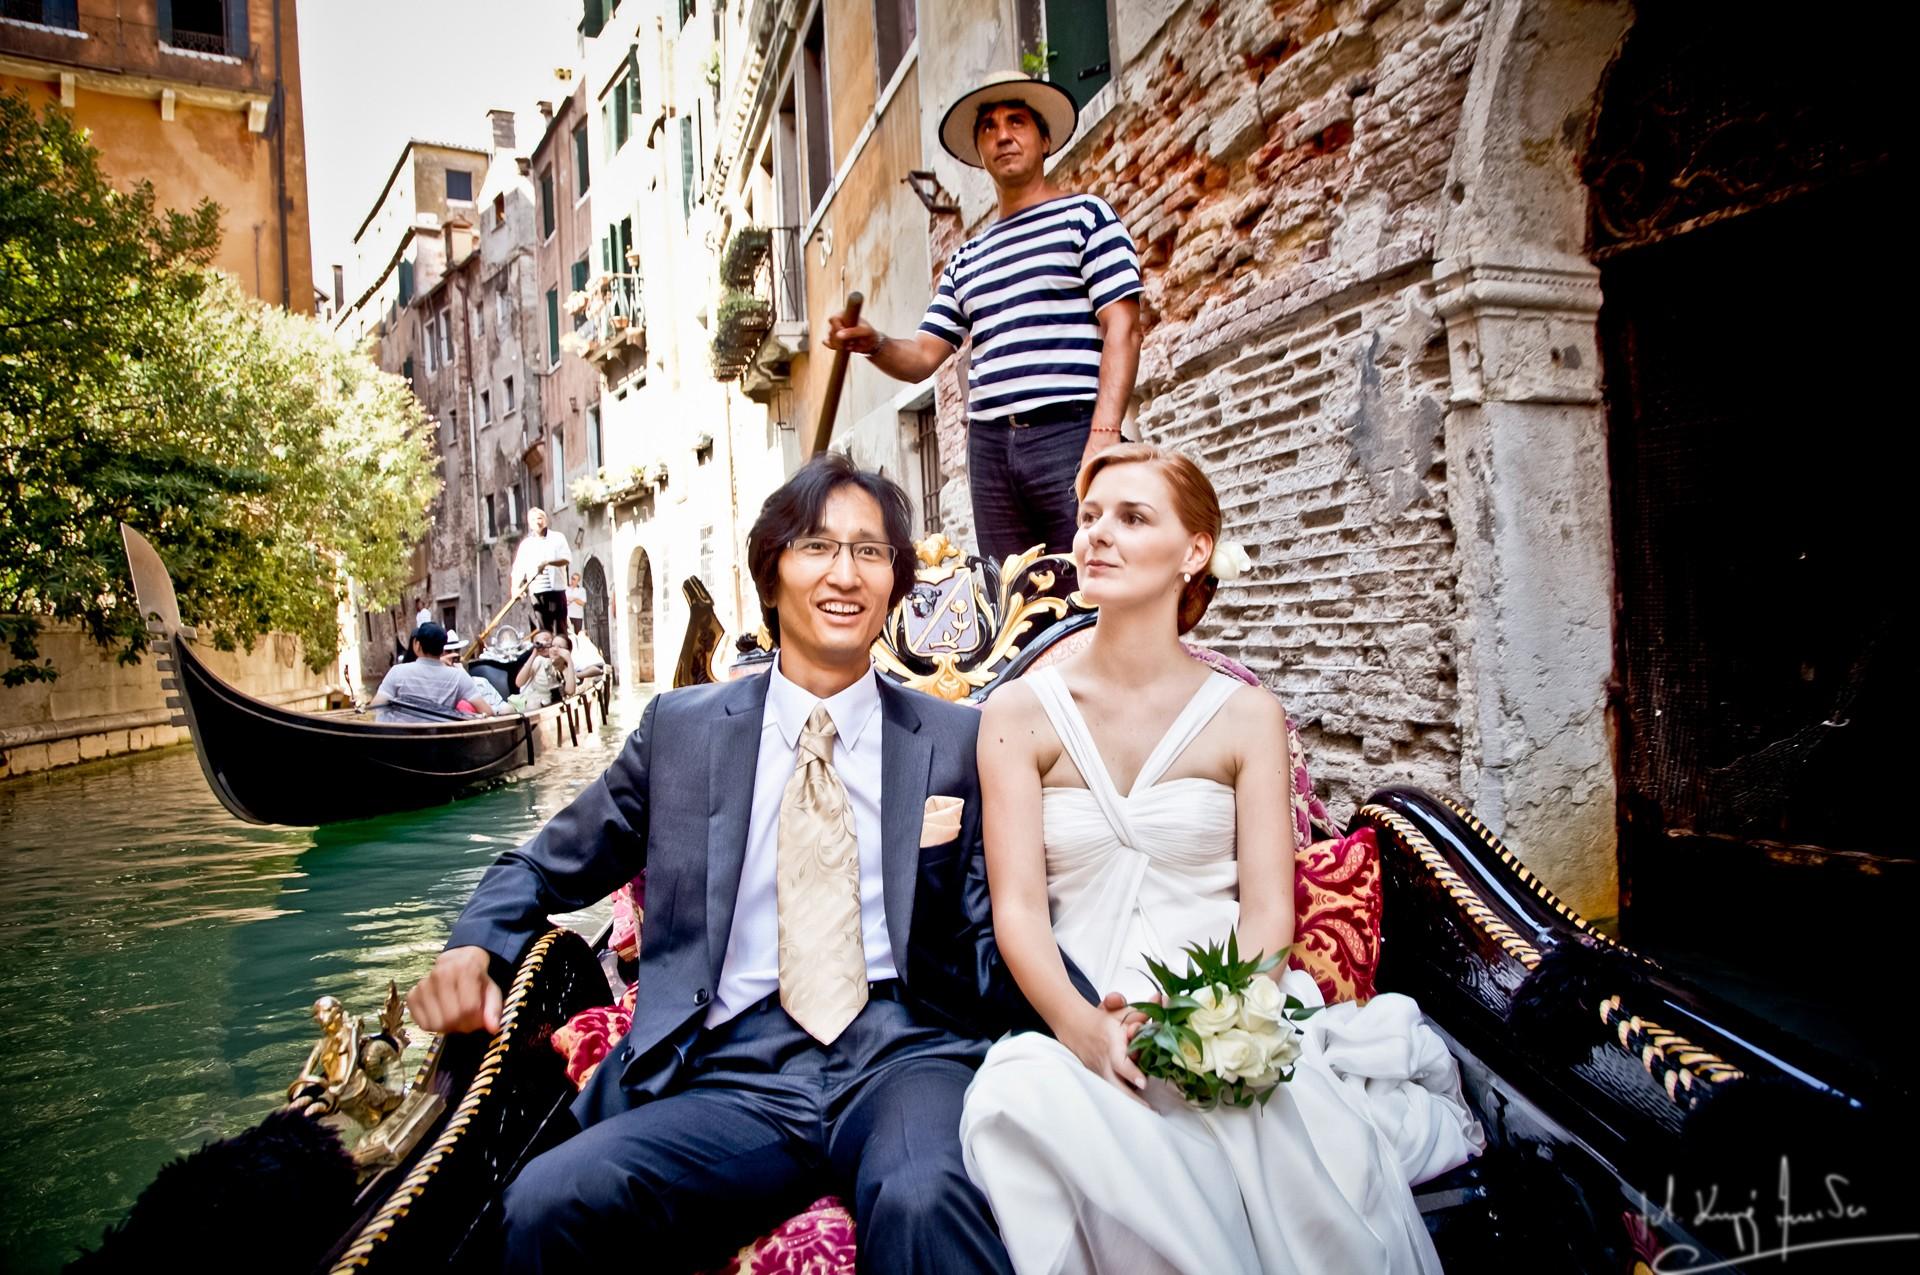 Ślub w wenecji 46 Manuela Luiza & Young Seon Song